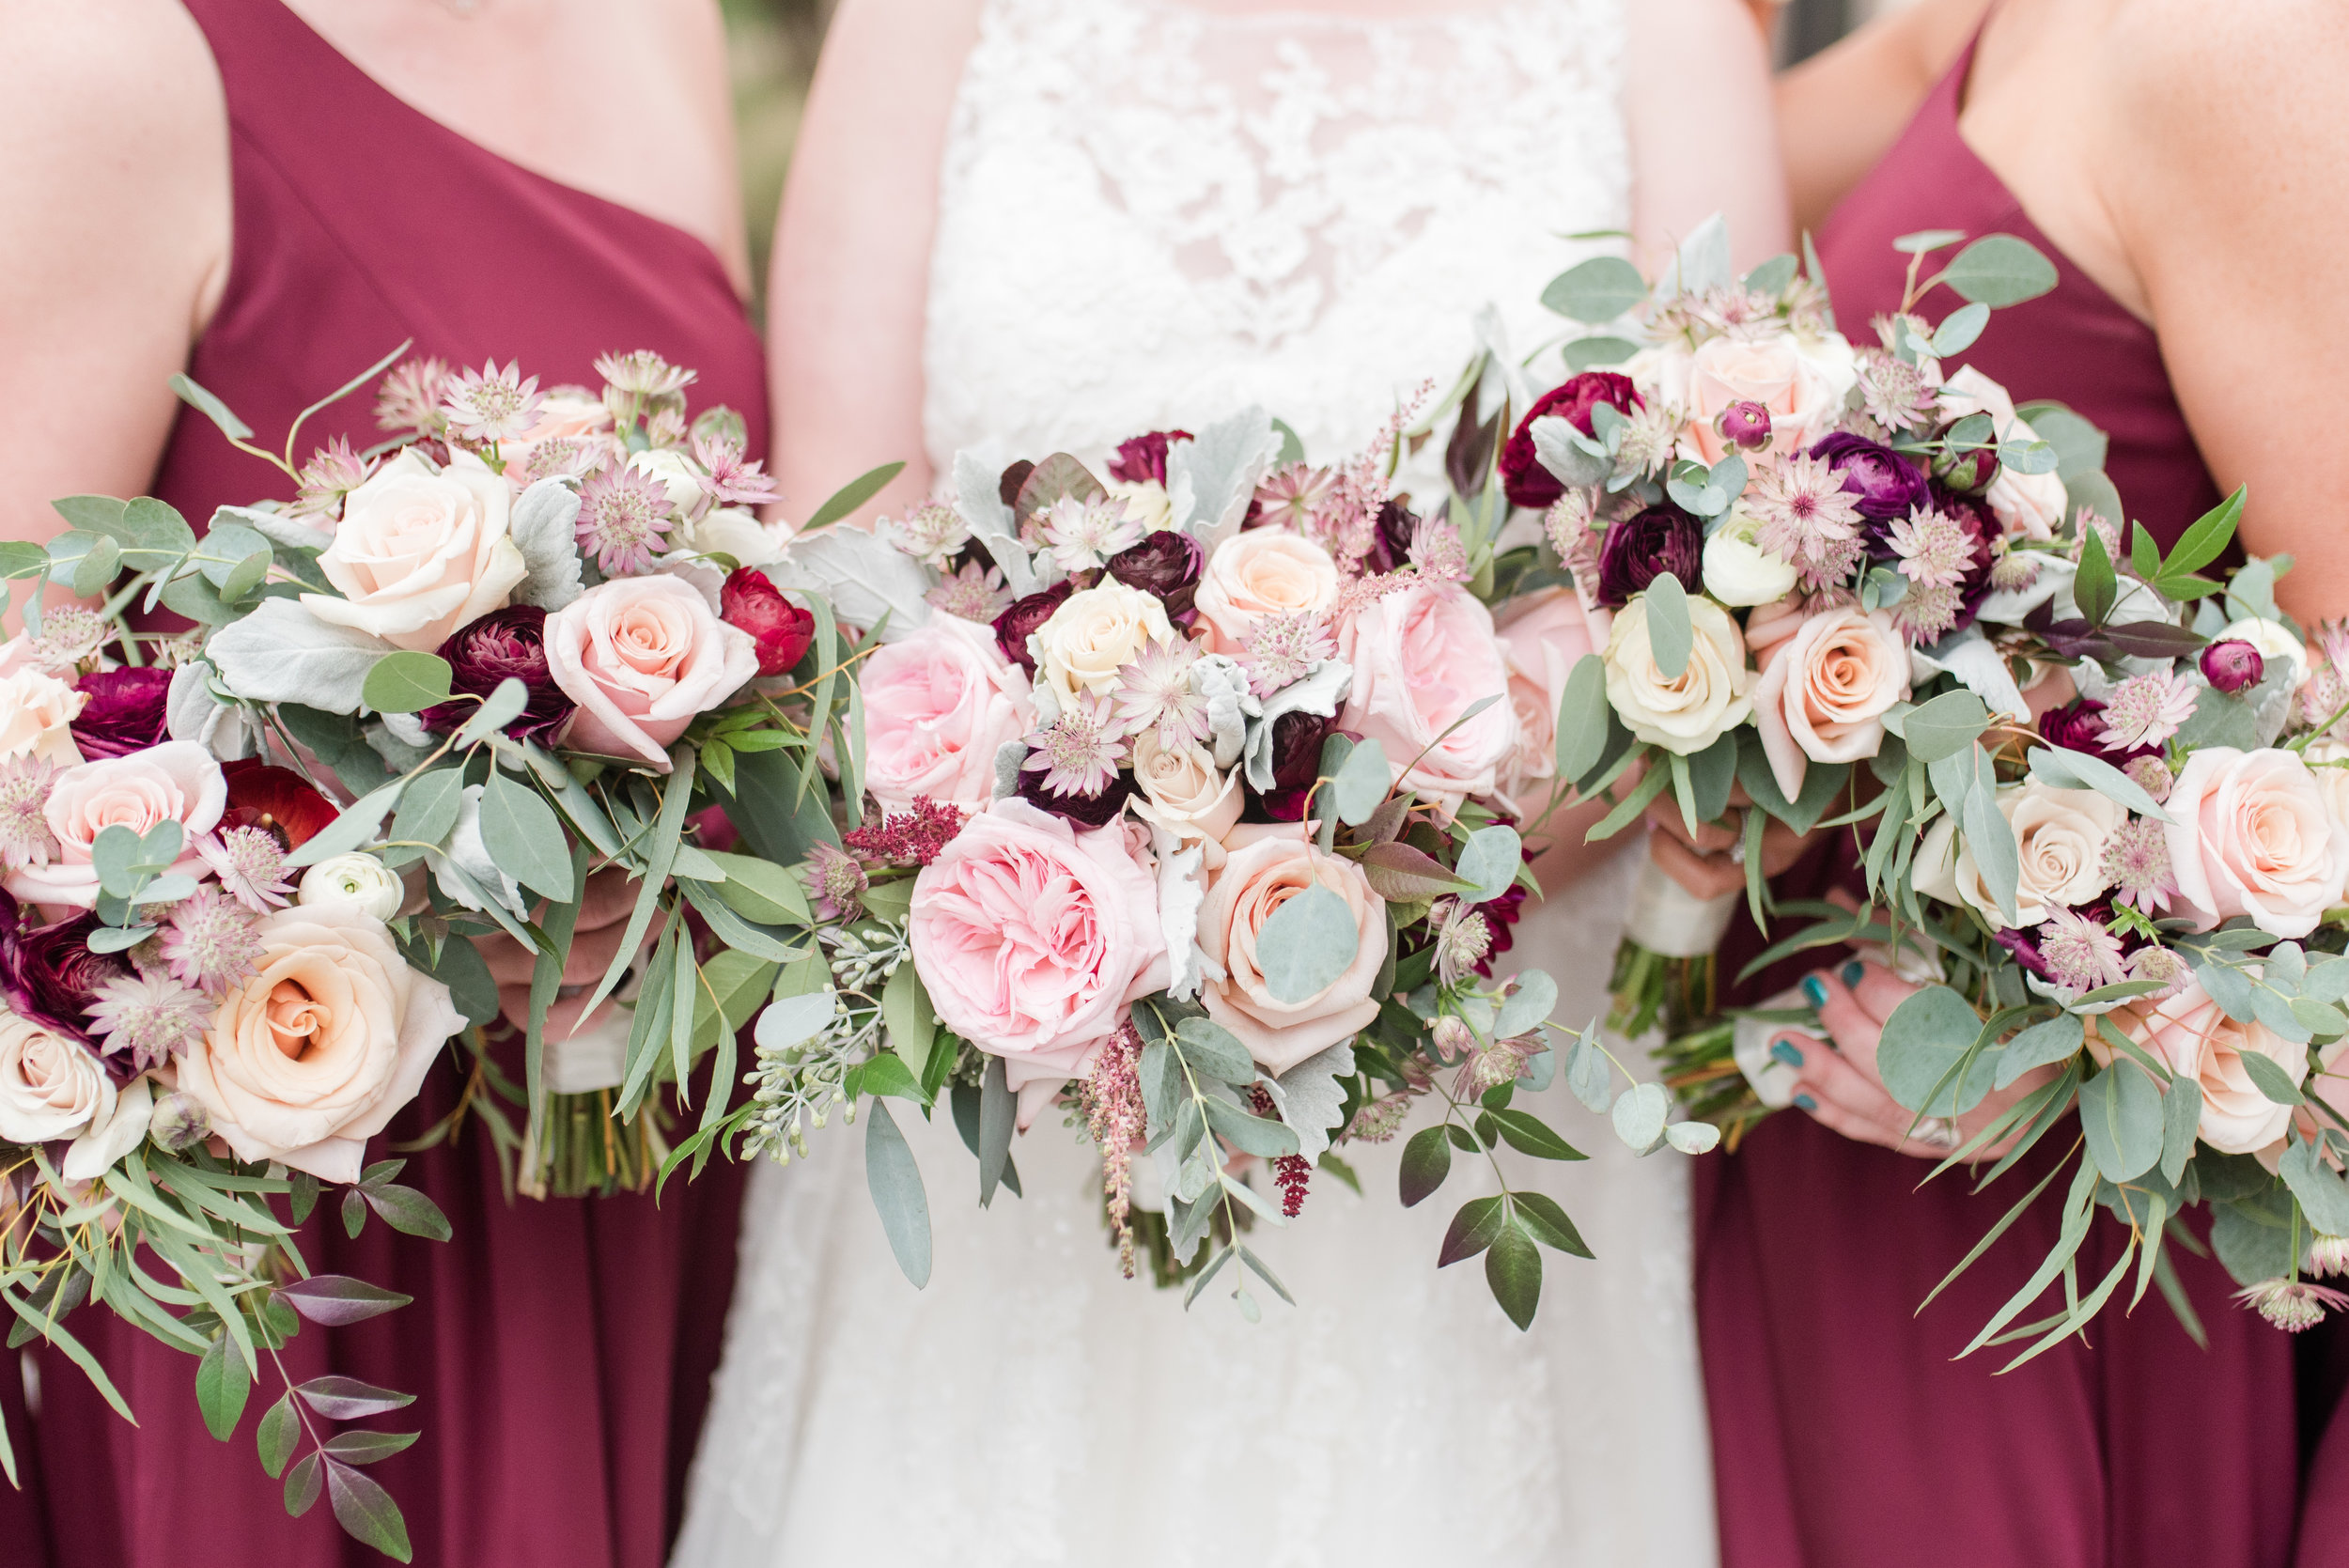 dana-will-wedding-photos-434 - Copy.jpg